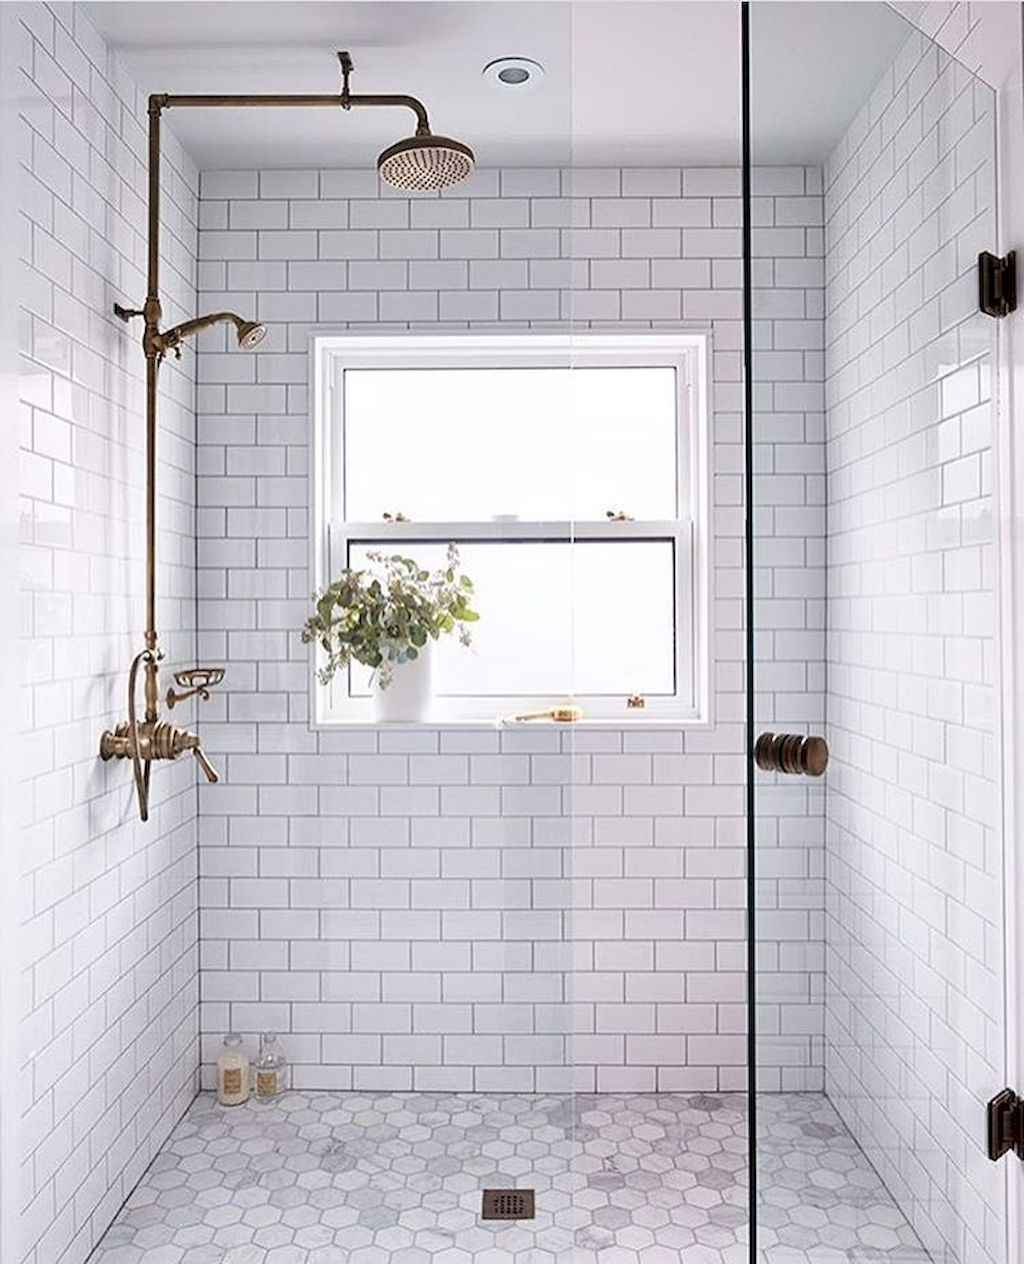 120 Stunning Bathroom Tile Shower Ideas (21) - CoachDecor.com